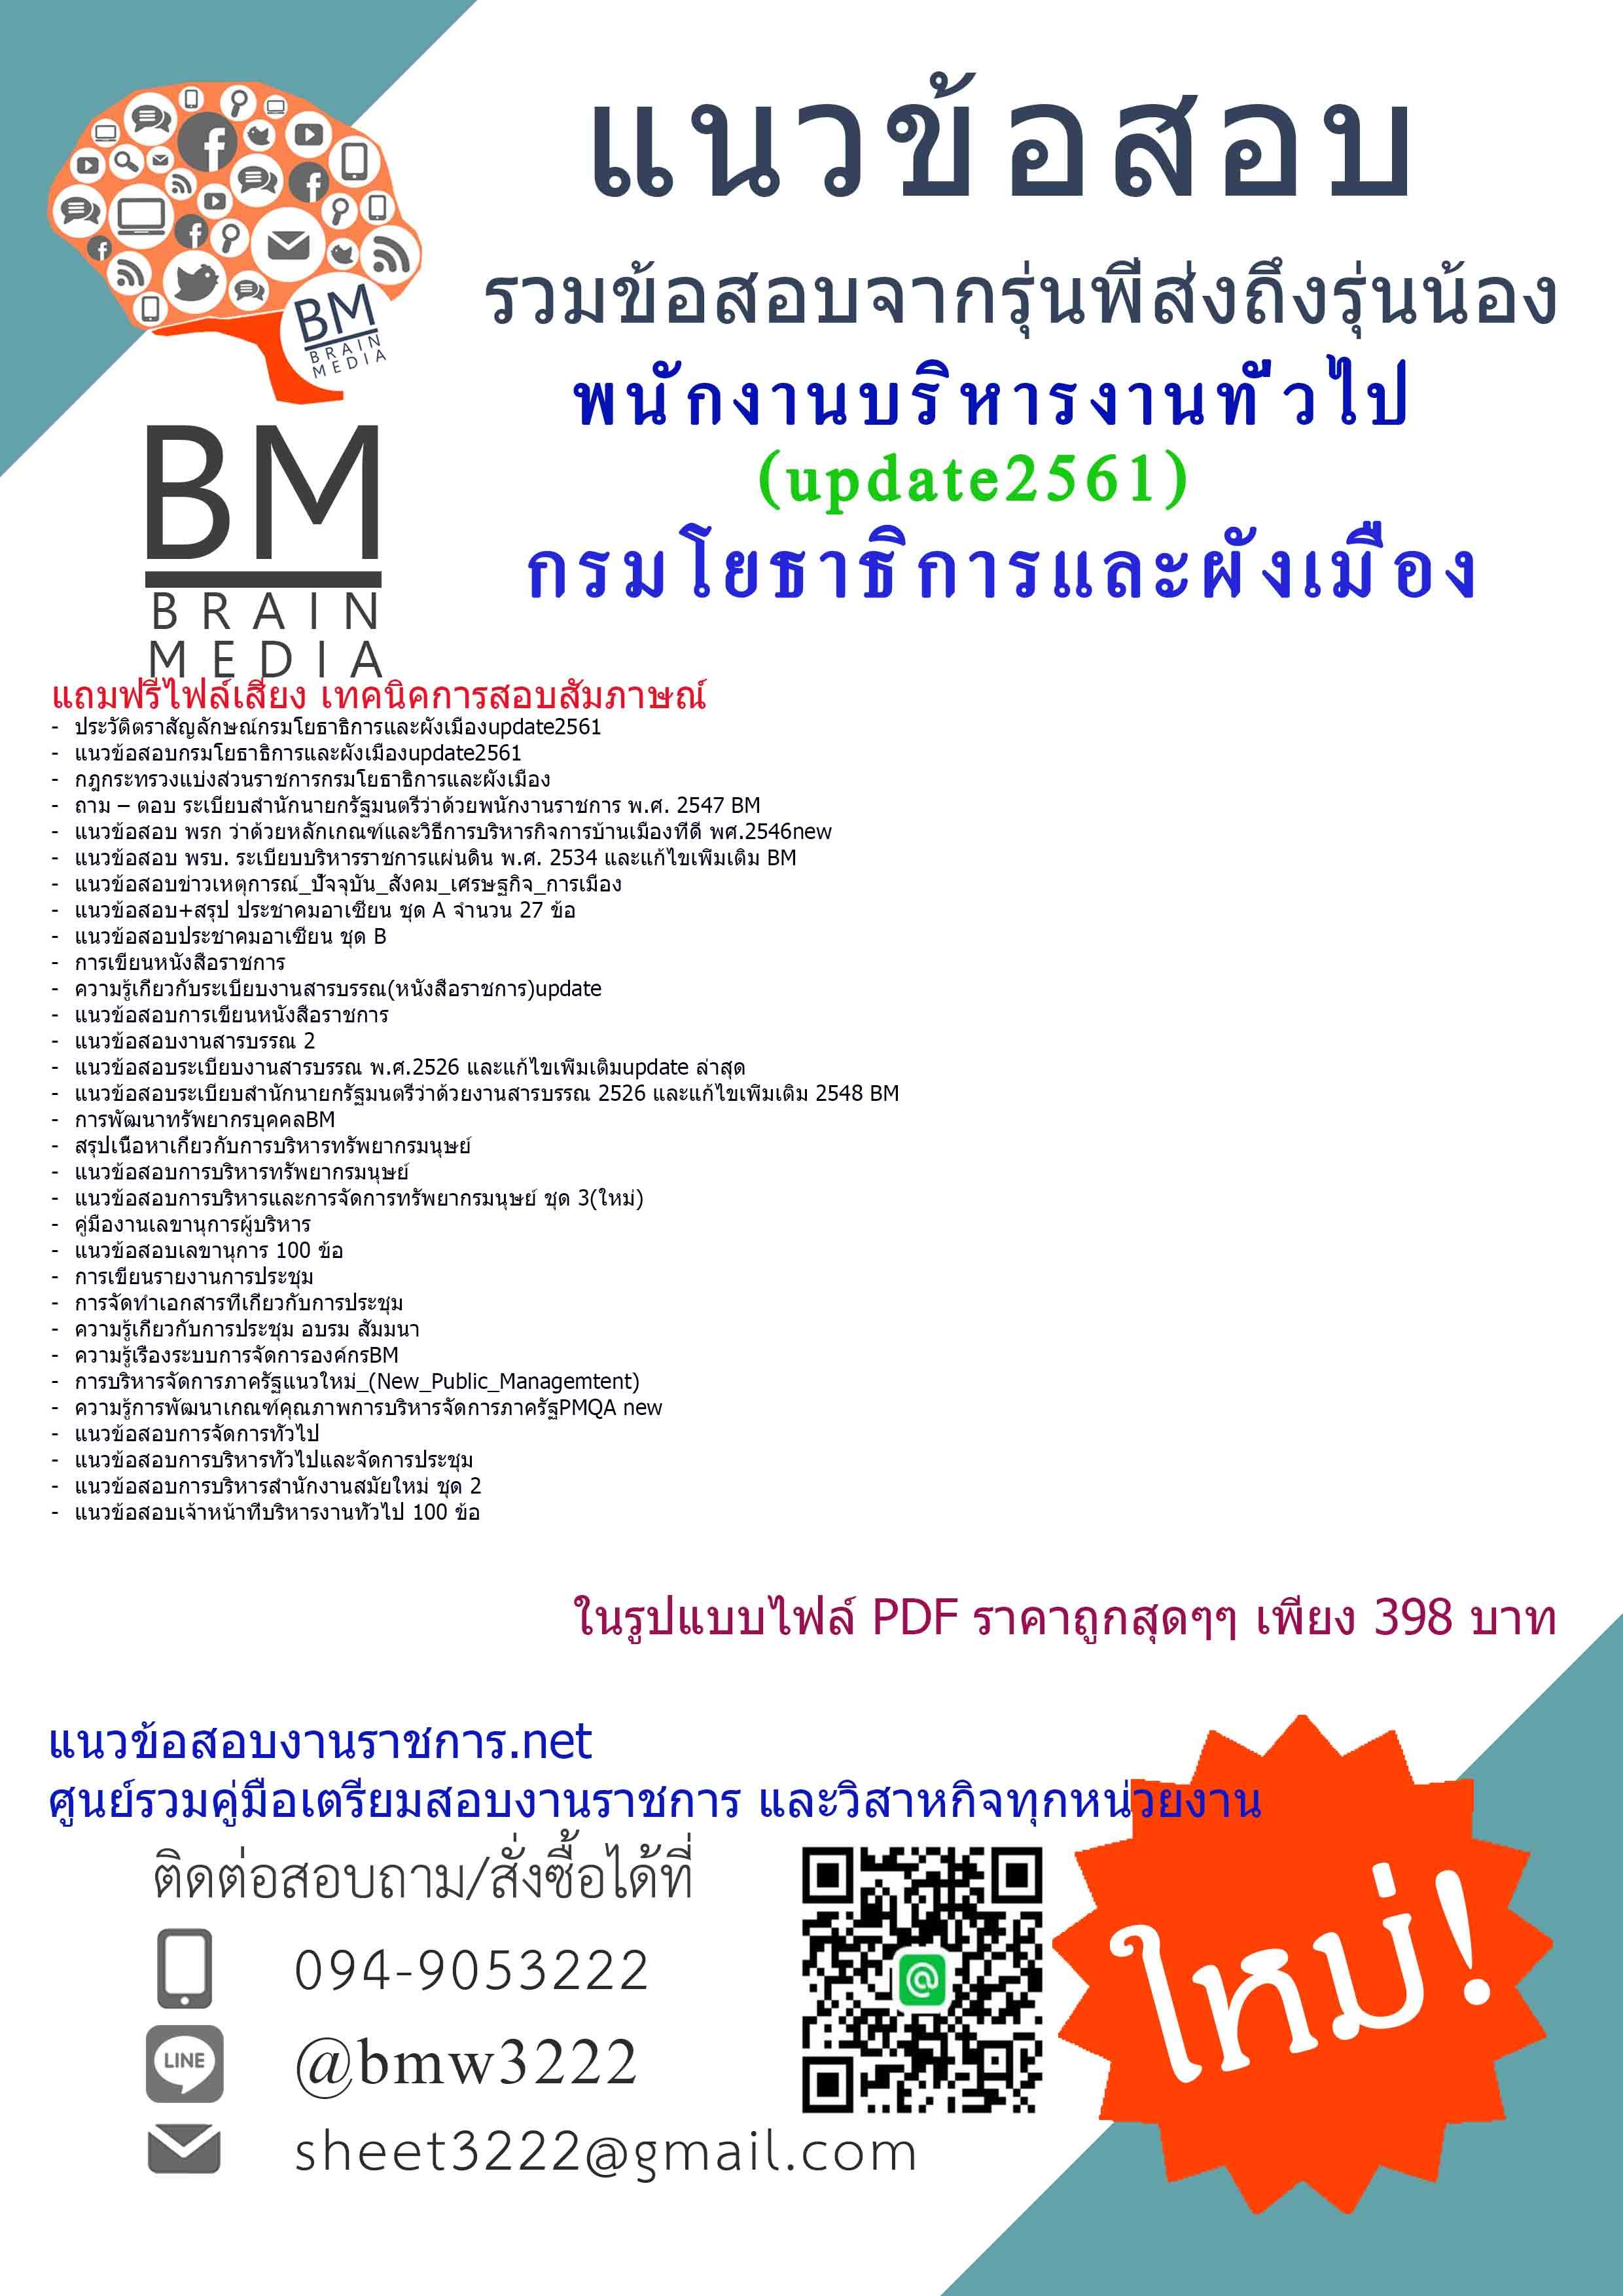 (((newupdateแน่นๆ!)))แนวข้อสอบพนักงานบริหารงานทั่วไปกรมโยธาธิการและผังเมือง2561